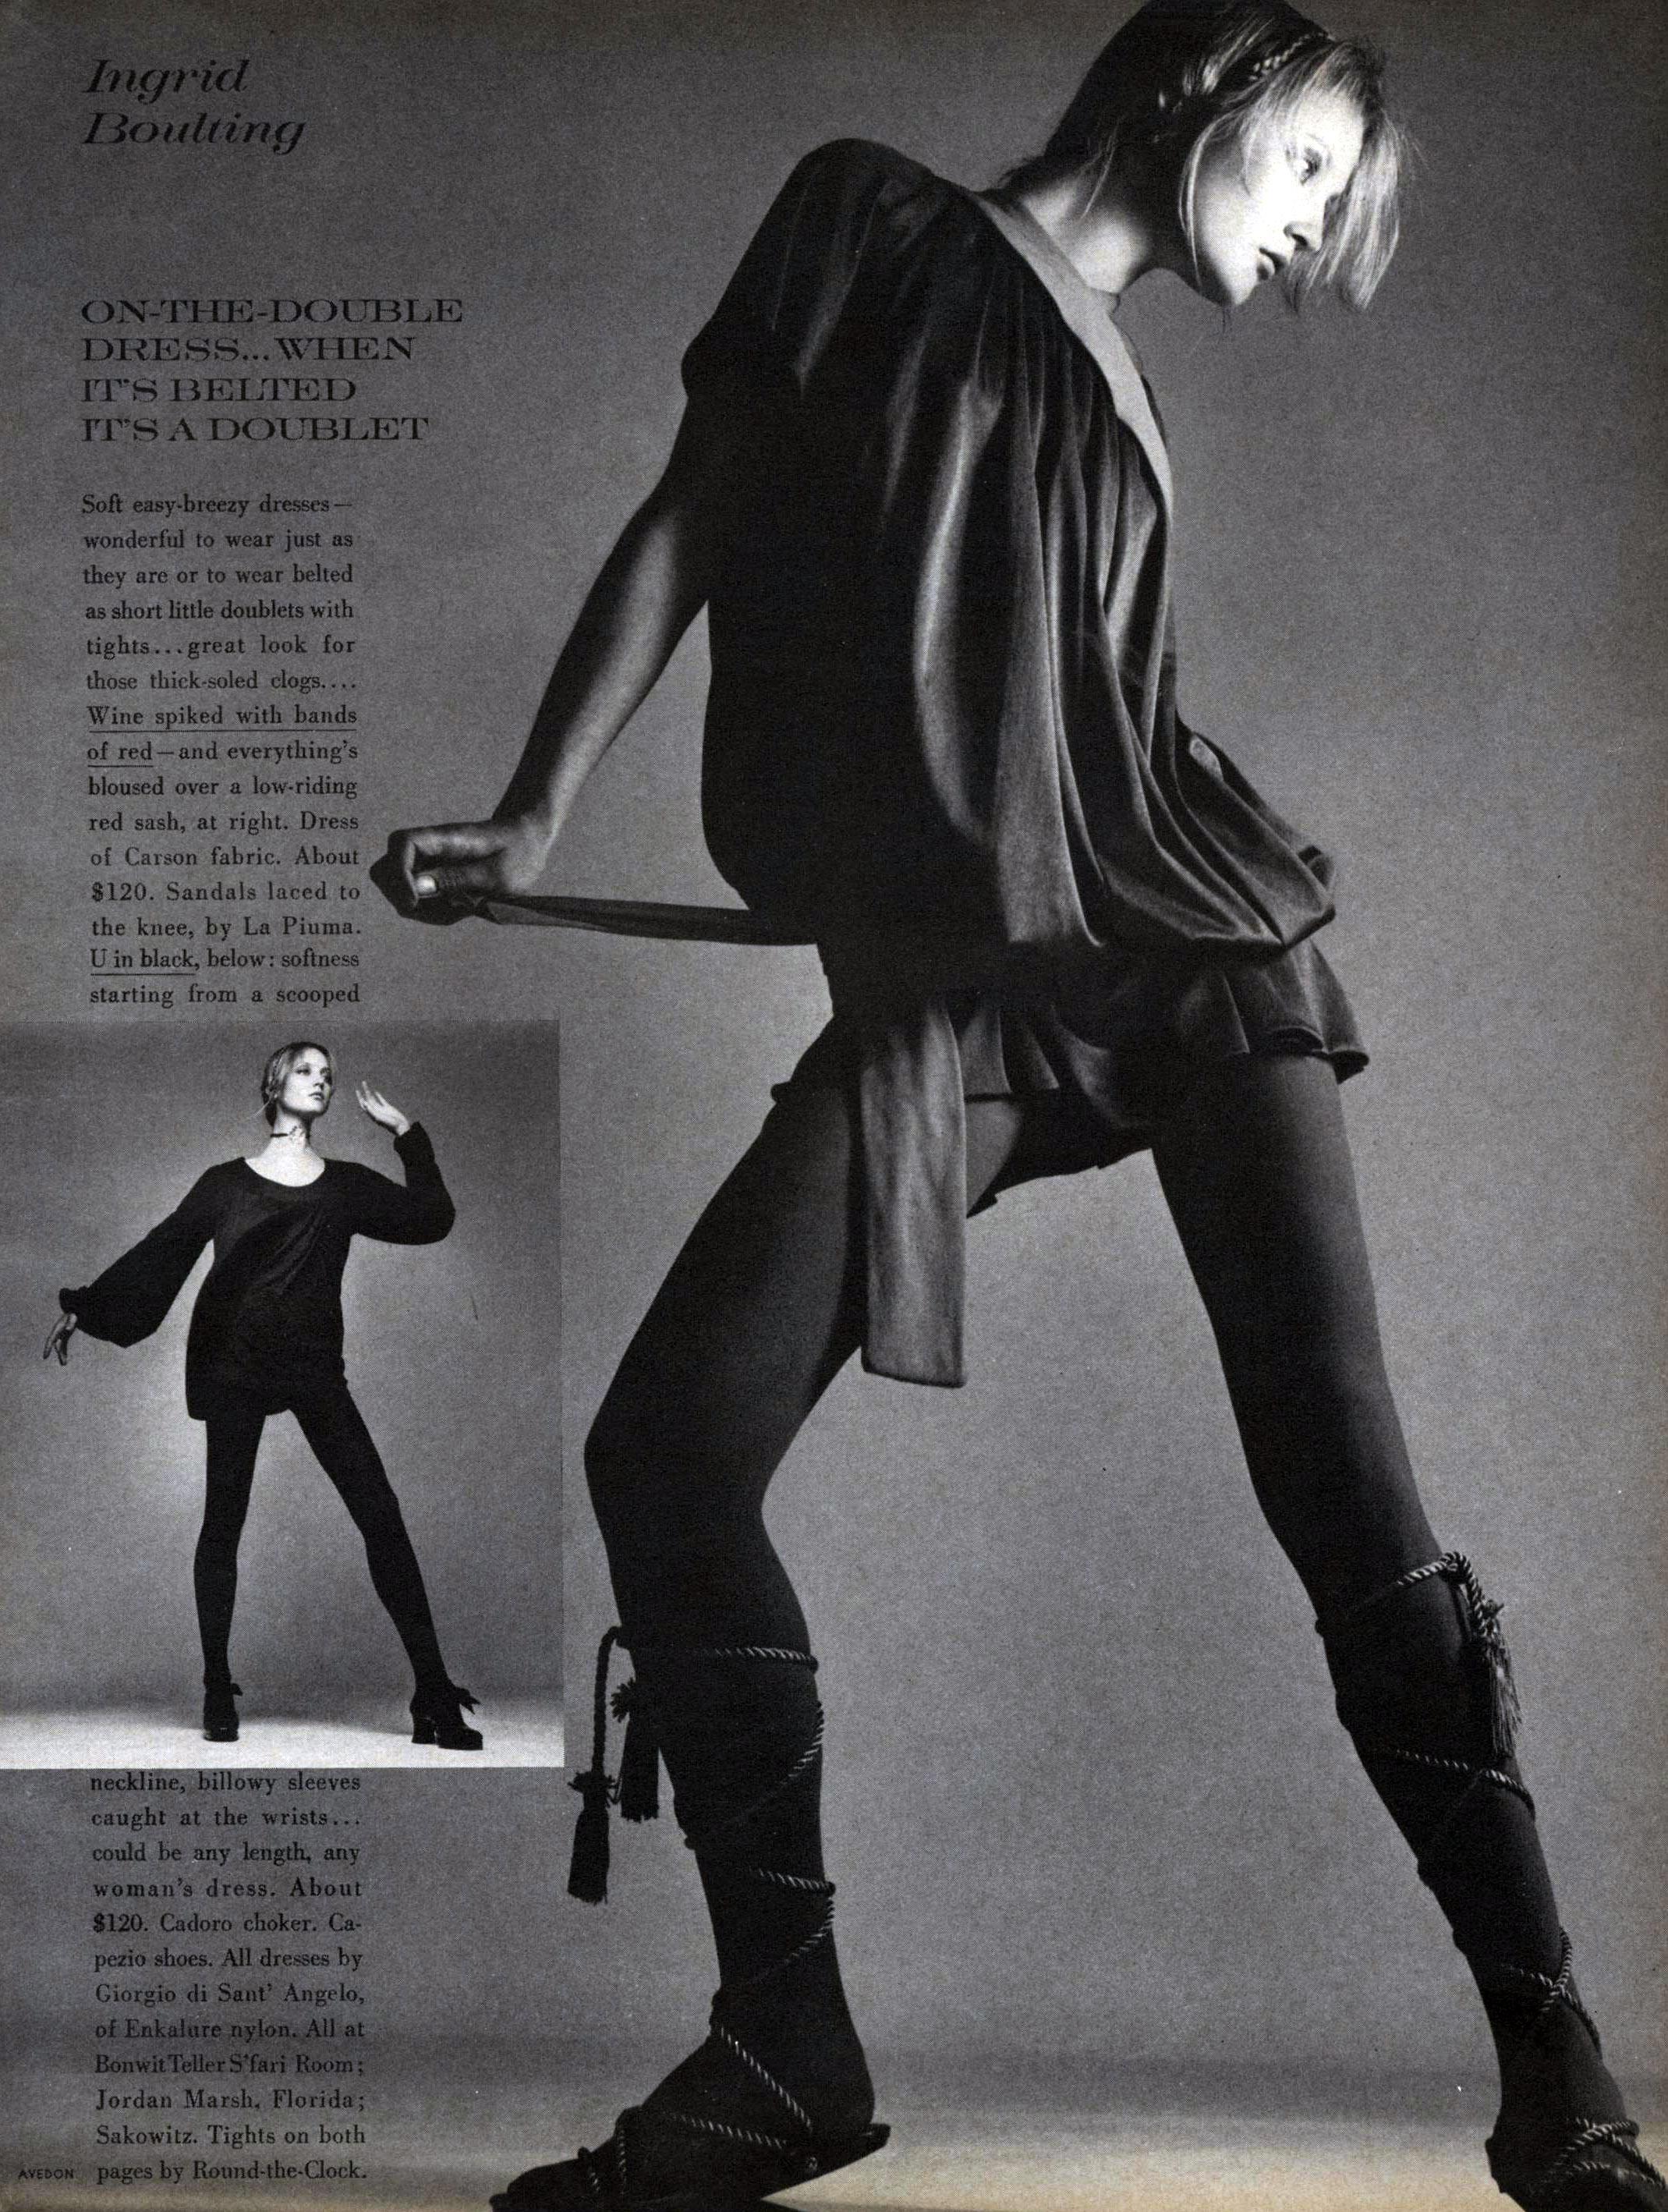 Dancerlike Ingrid photographed by Richard Avedon for Vogue, October 15th, 1969.